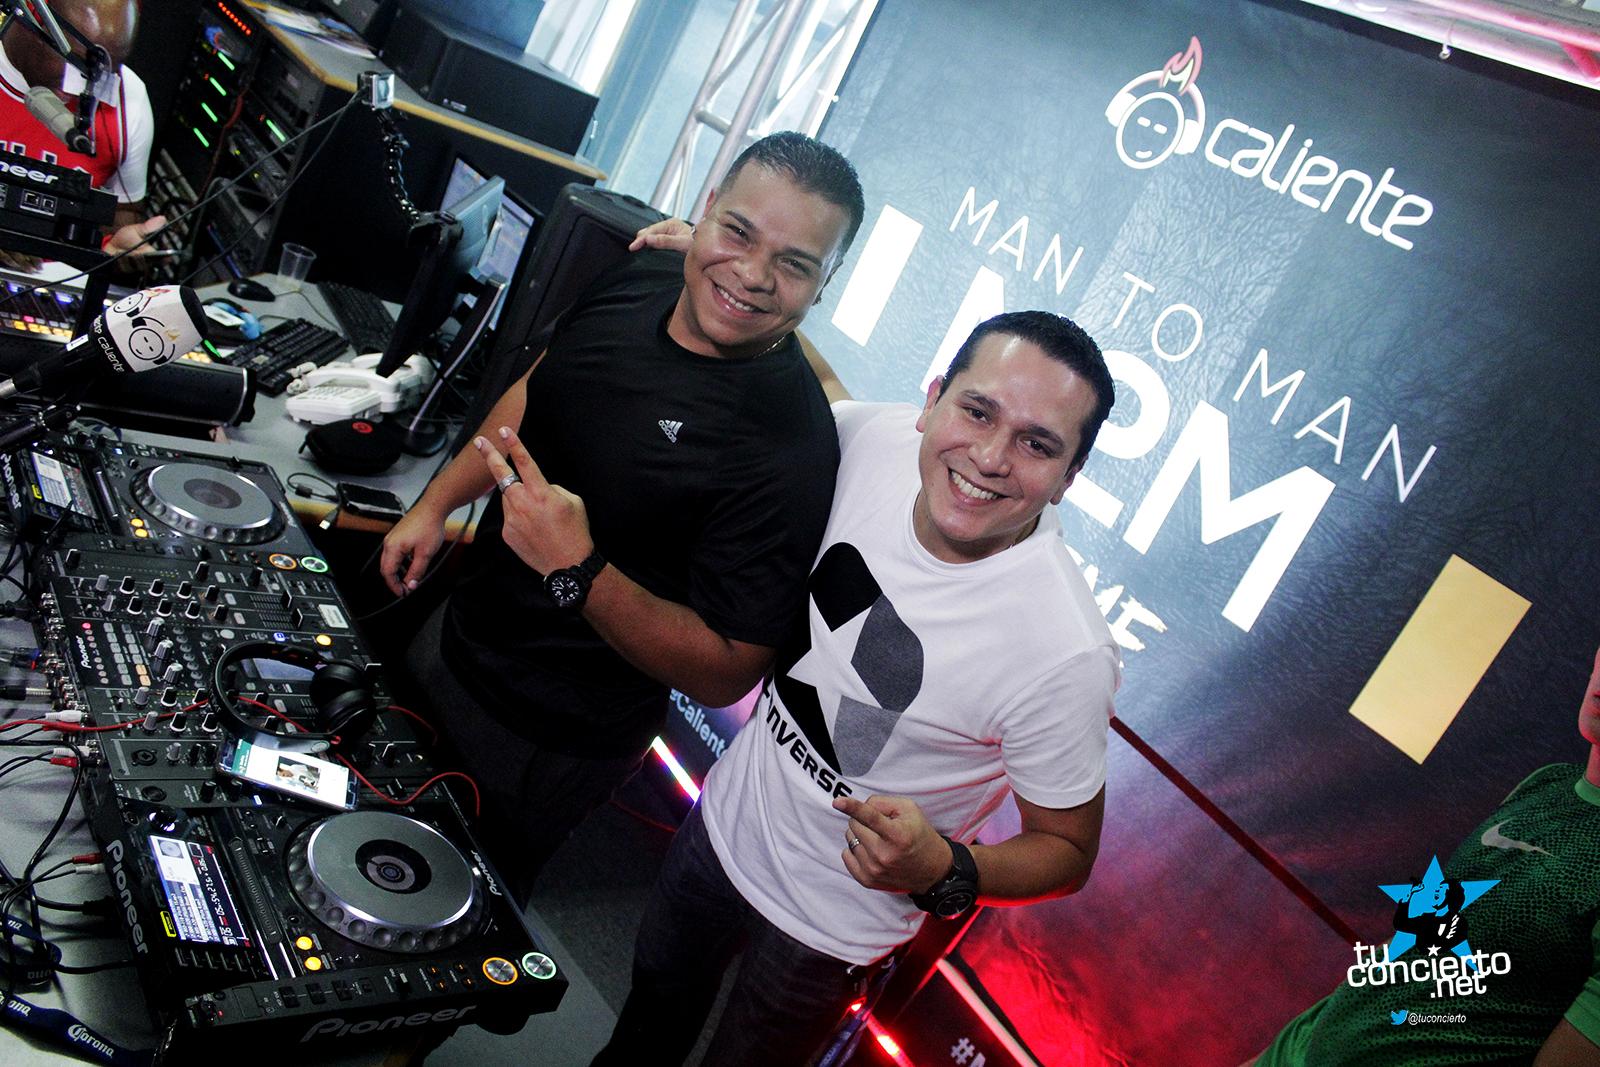 Photo of M2M Xtreme Caliente Radio